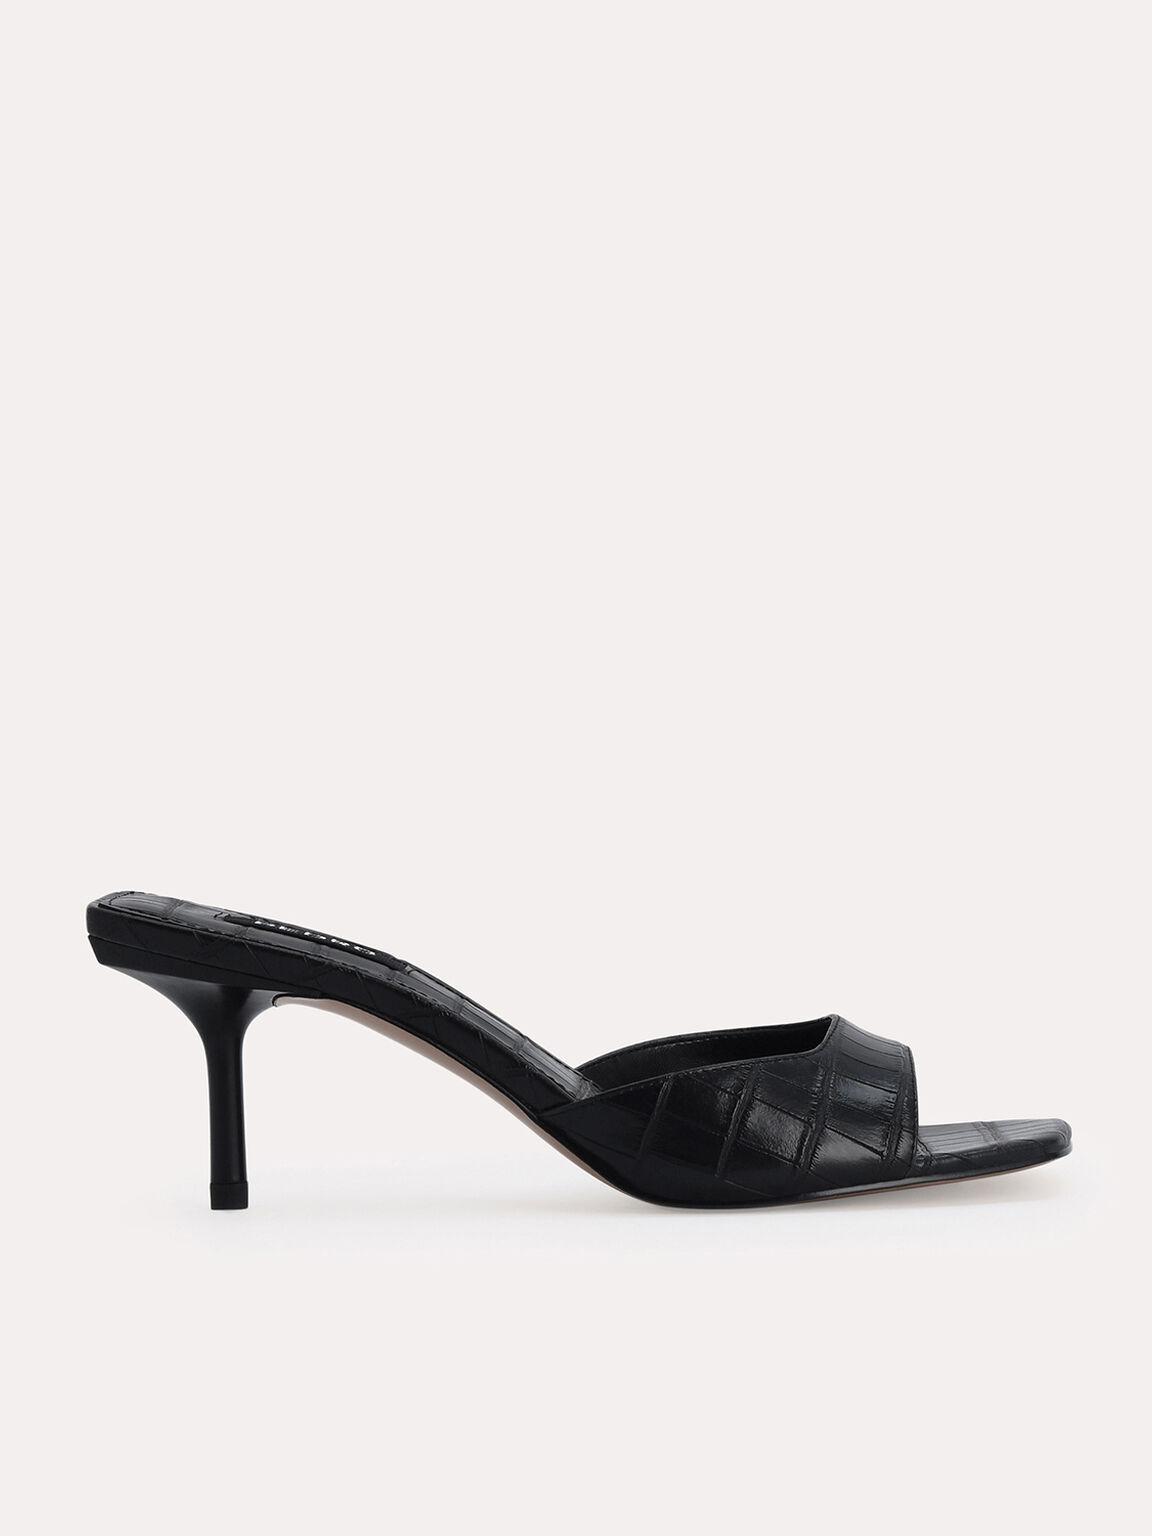 Croc-Effect Heeled Sandals, Black, hi-res